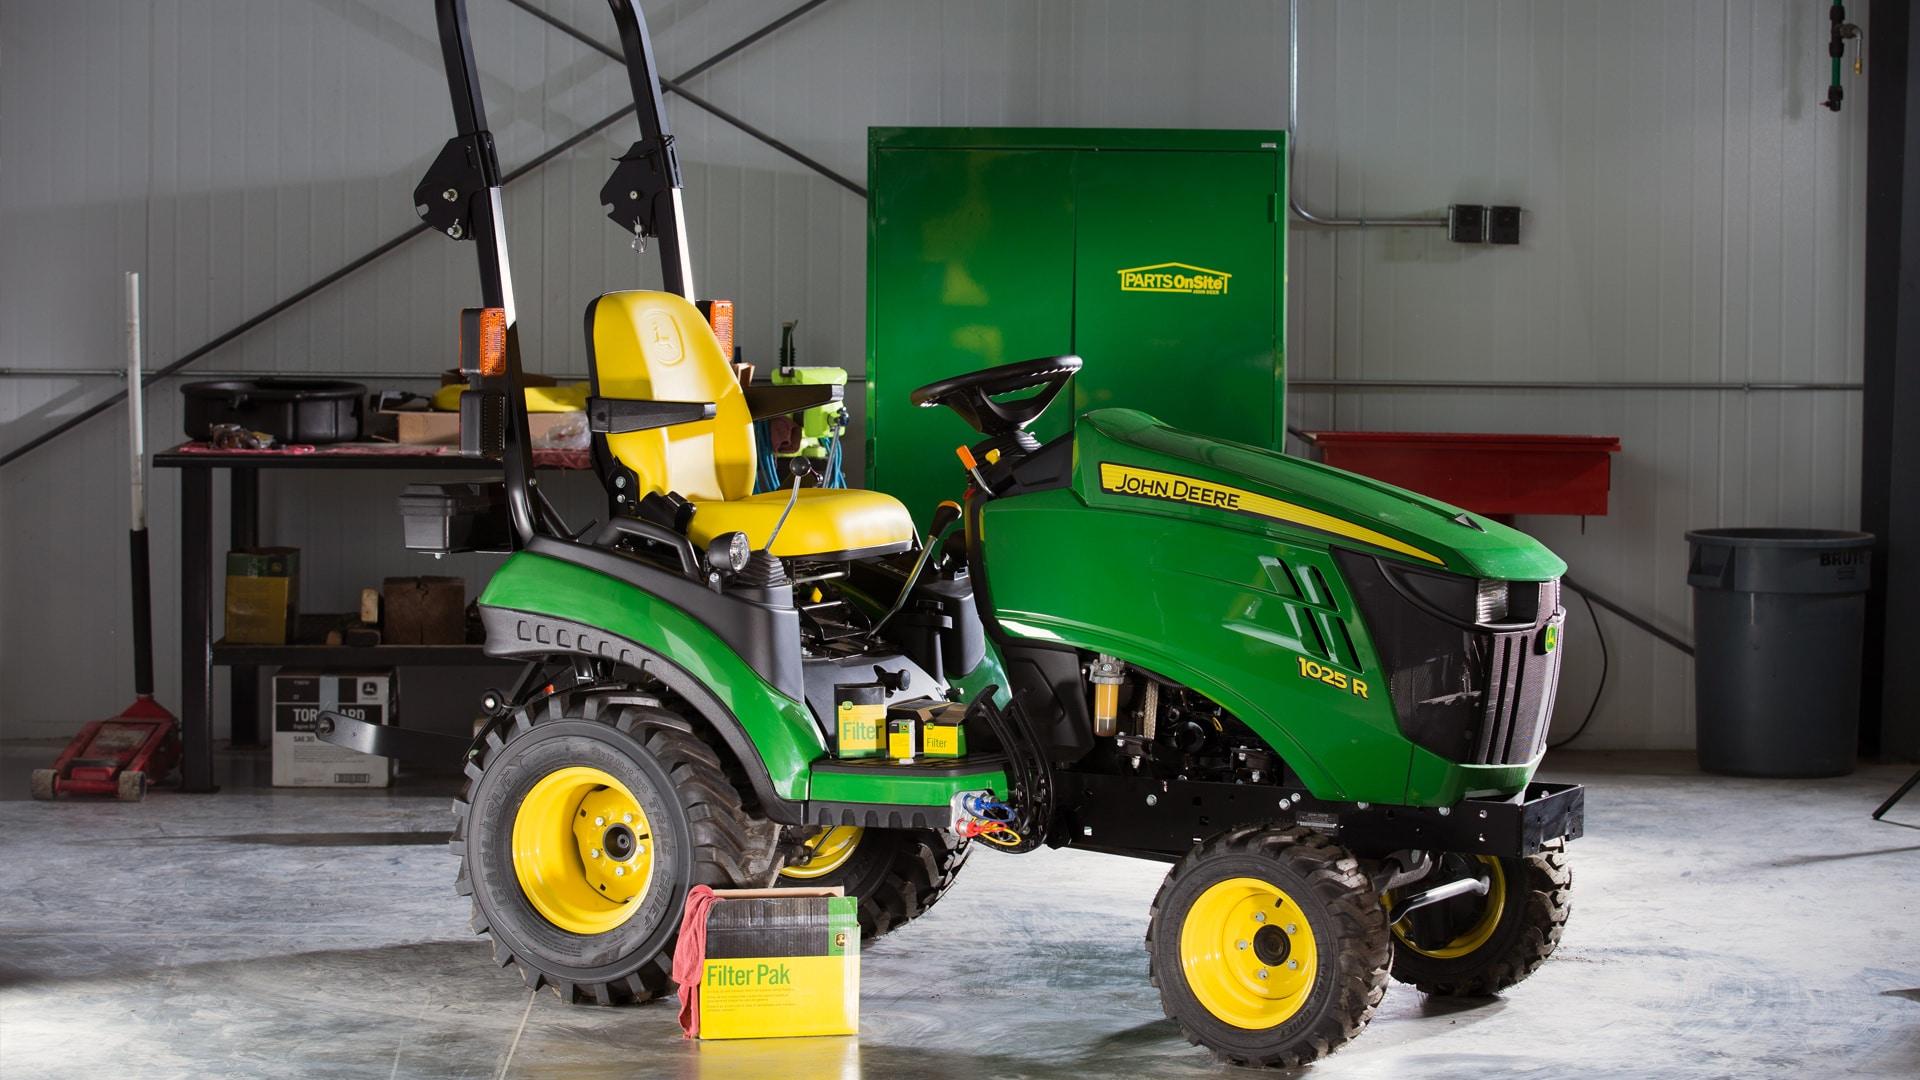 1family-utility-tractor-diy-r4e023902